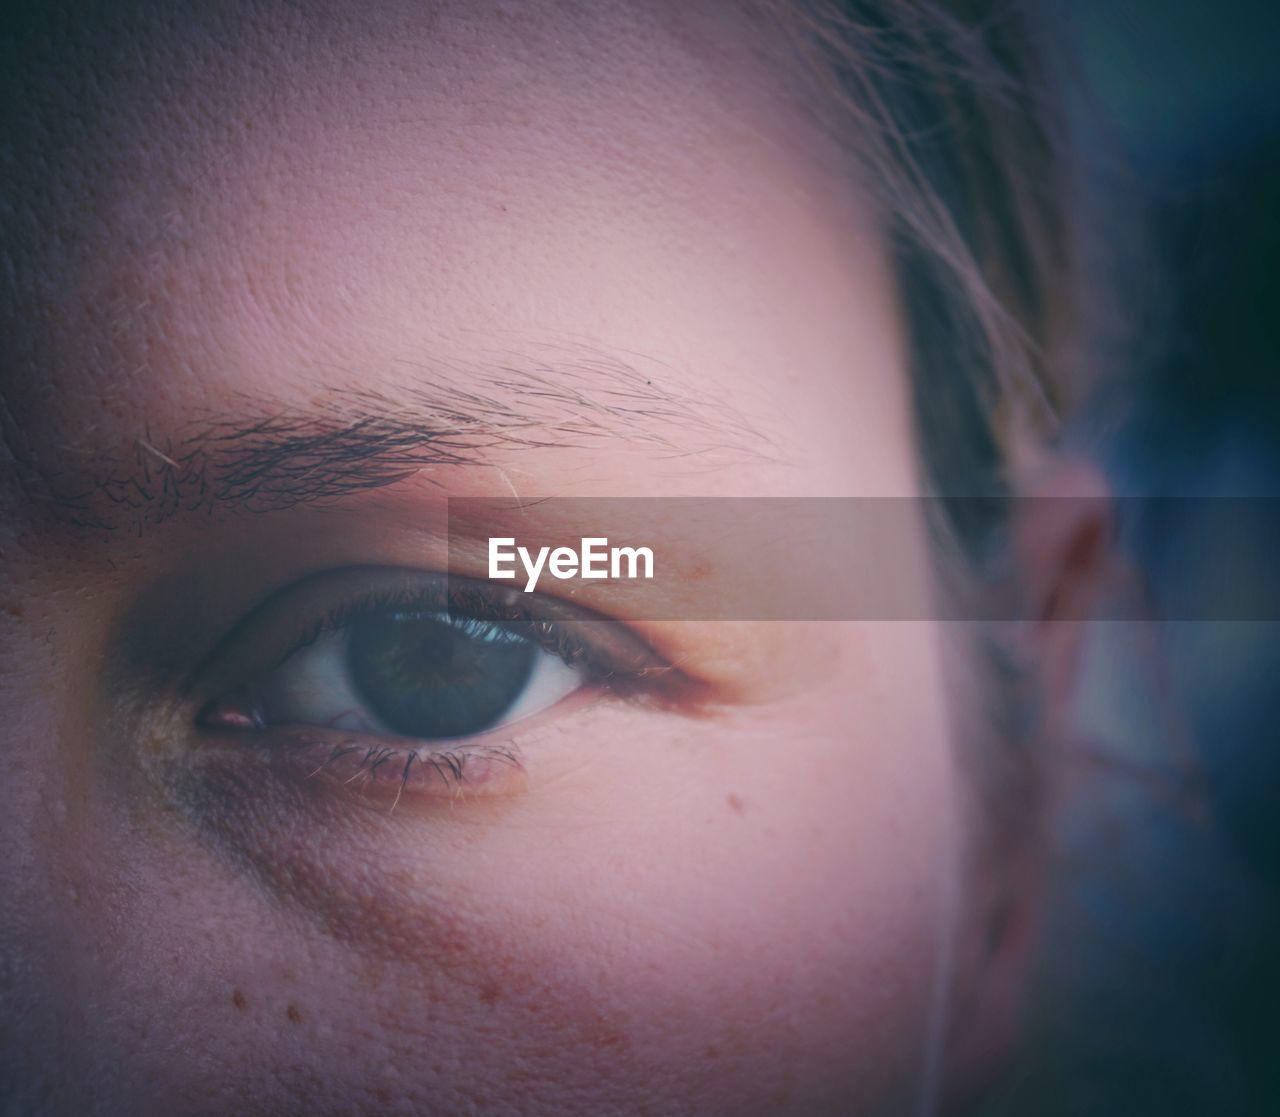 human eye, one person, human body part, real people, close-up, sensory perception, looking at camera, human skin, portrait, eyebrow, eyelash, eyeball, human face, eyesight, women, day, outdoors, young adult, adult, people